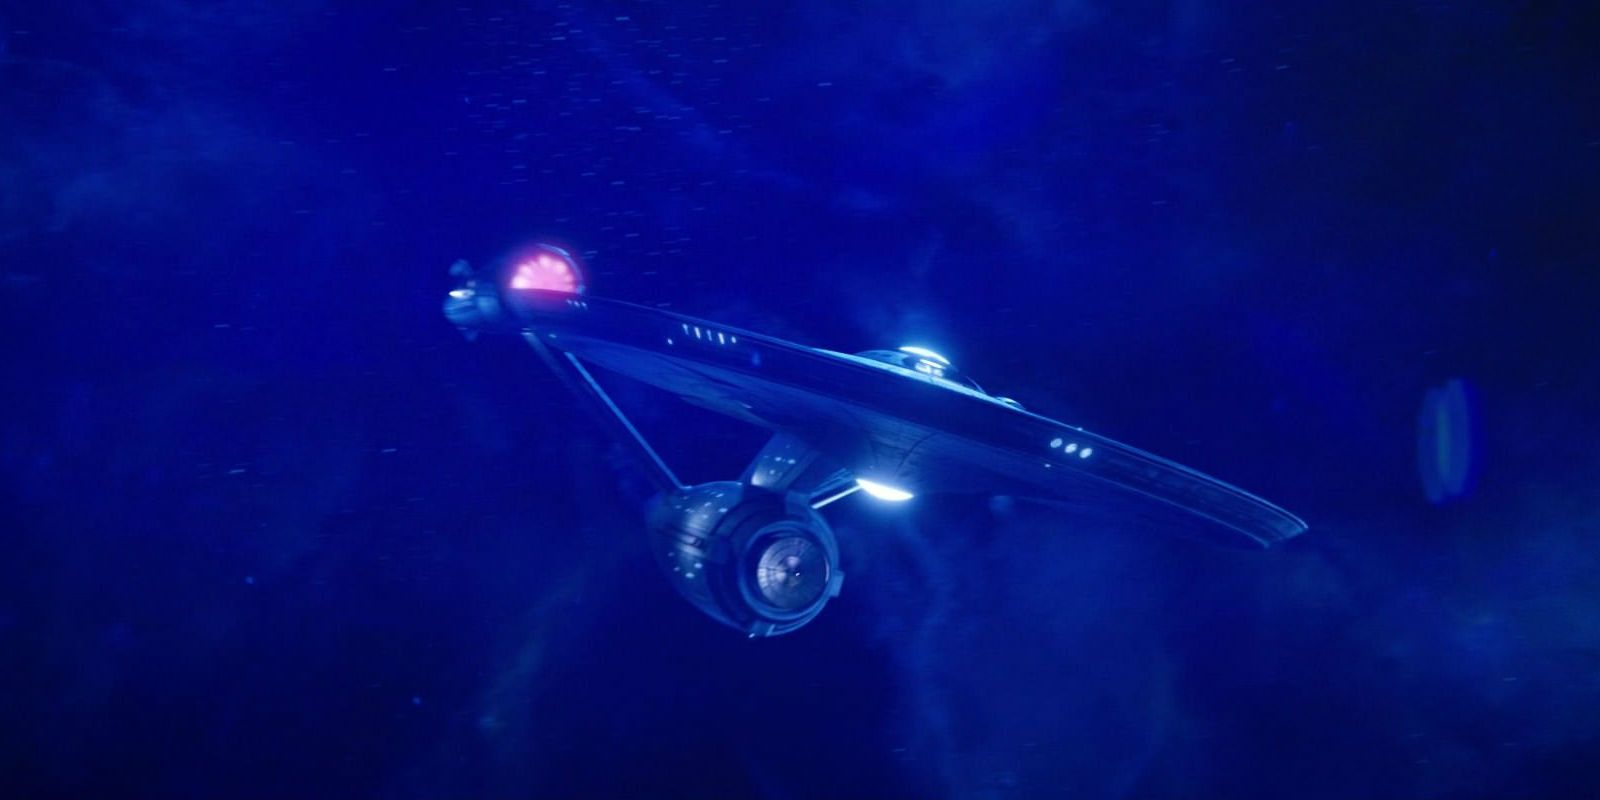 Star Trek: Discovery Season 2 Teases The USS Enterprise